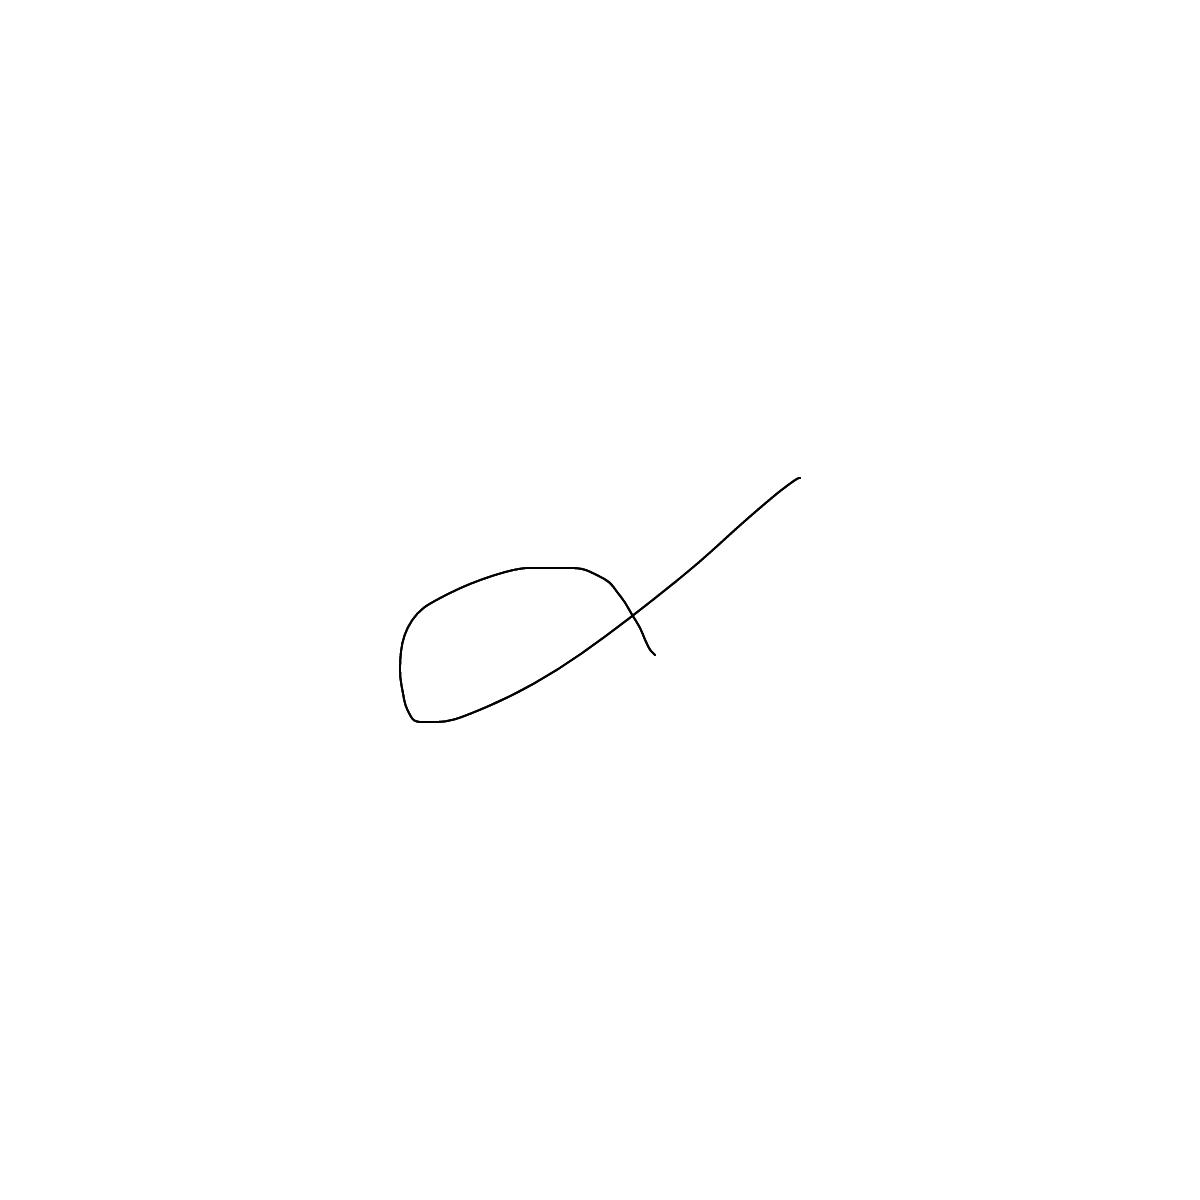 BAAAM drawing#25 lat:51.7950286865234400lng: 9.5800781250000000